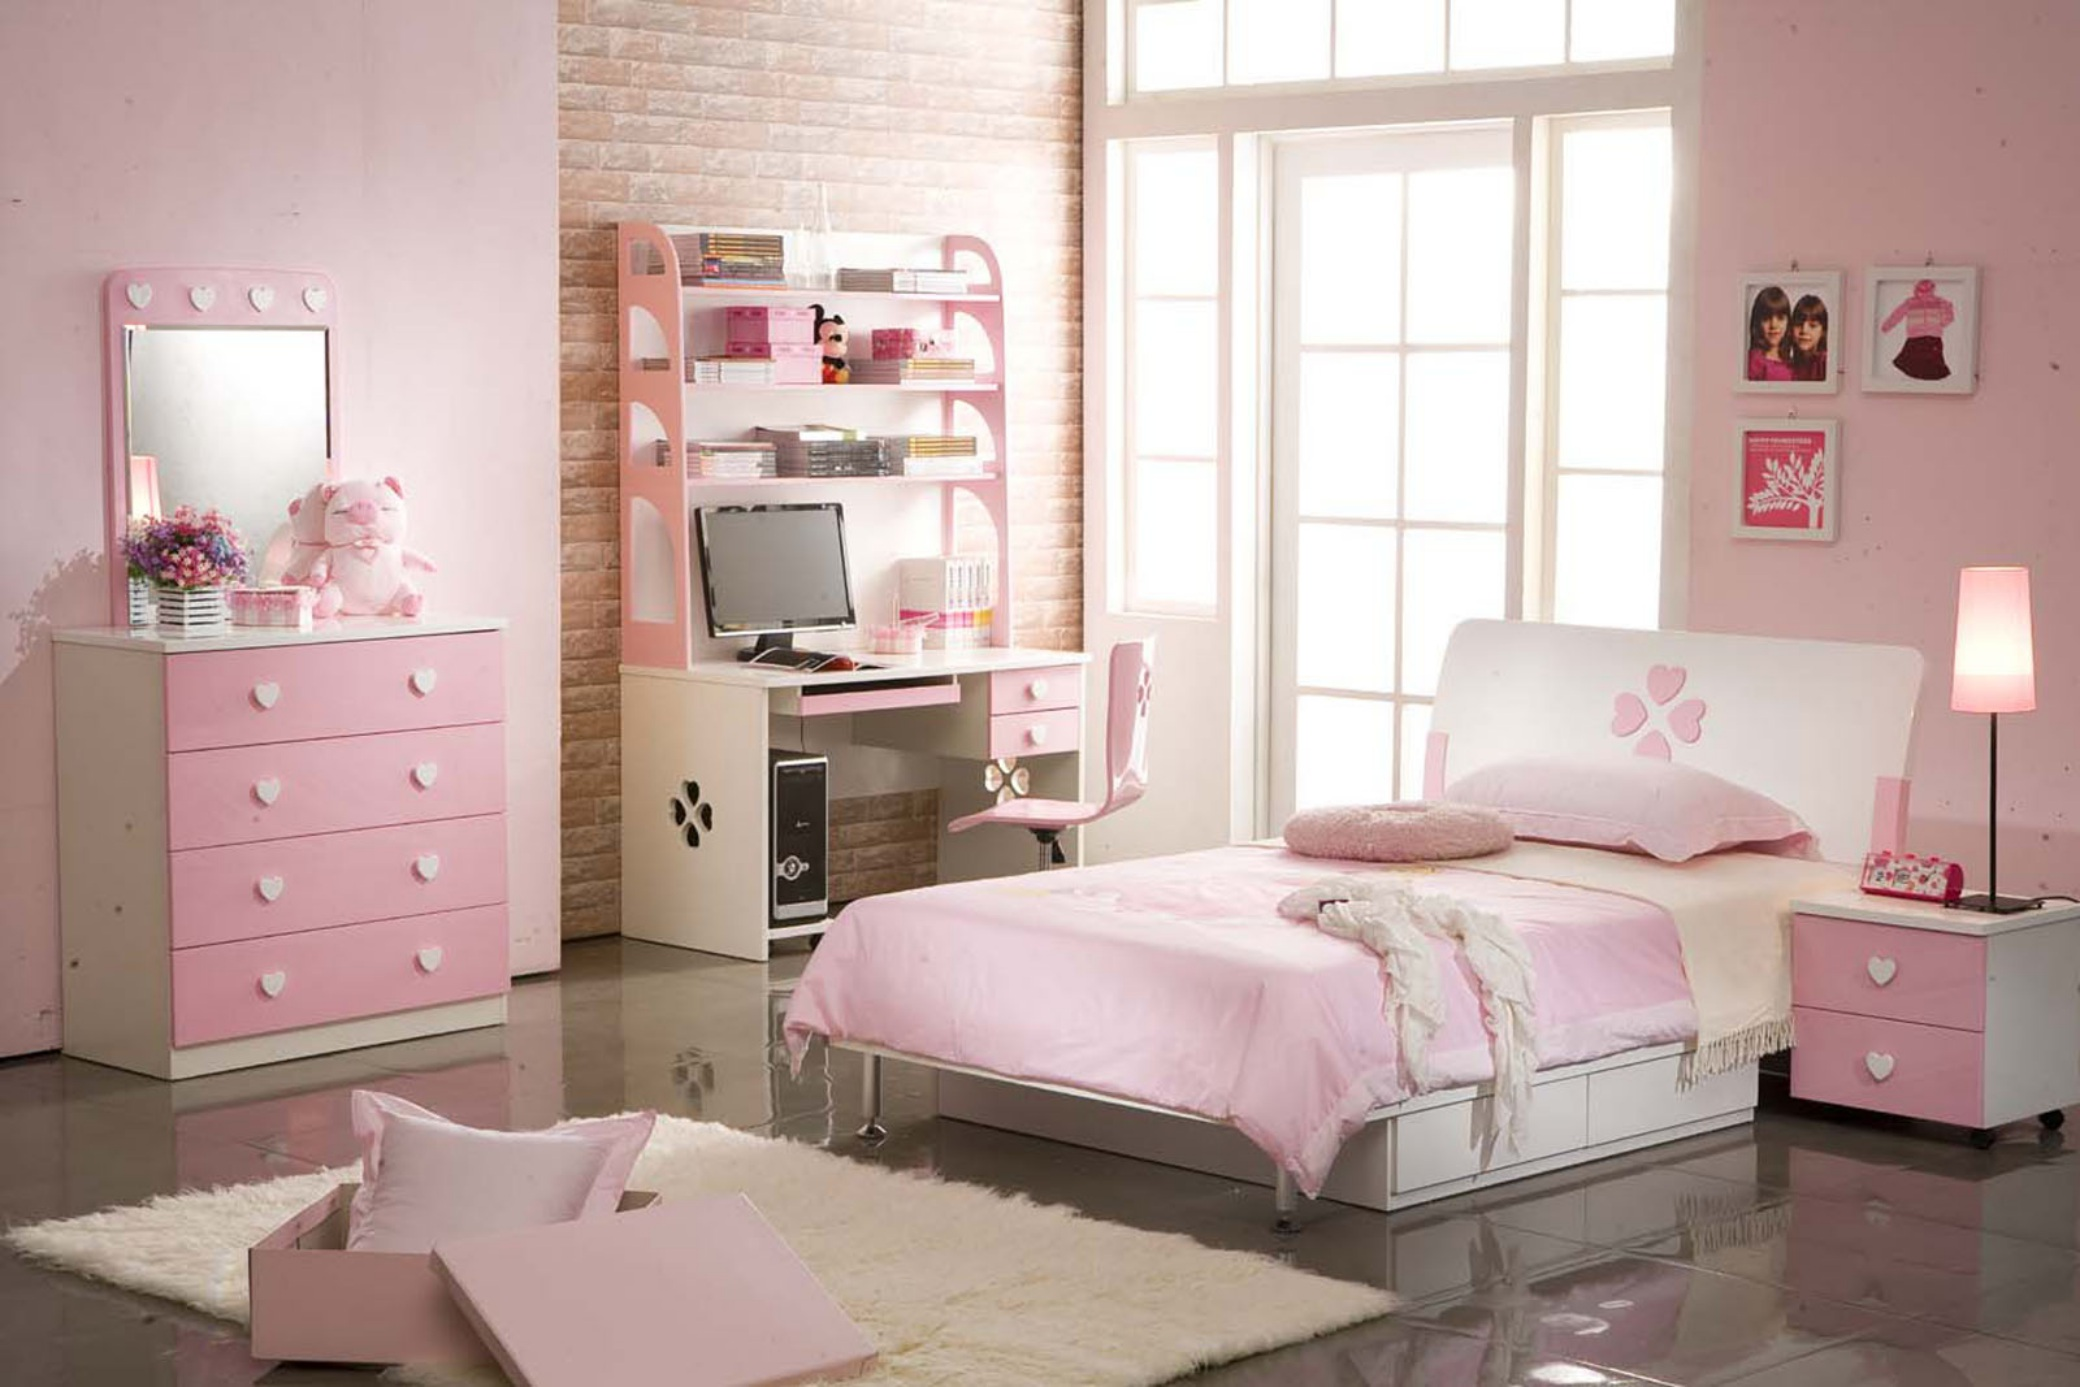 اجمل غرف نوم بنات كبارديكور غرف الصبايا Teenage Girl Bedroom Ideas